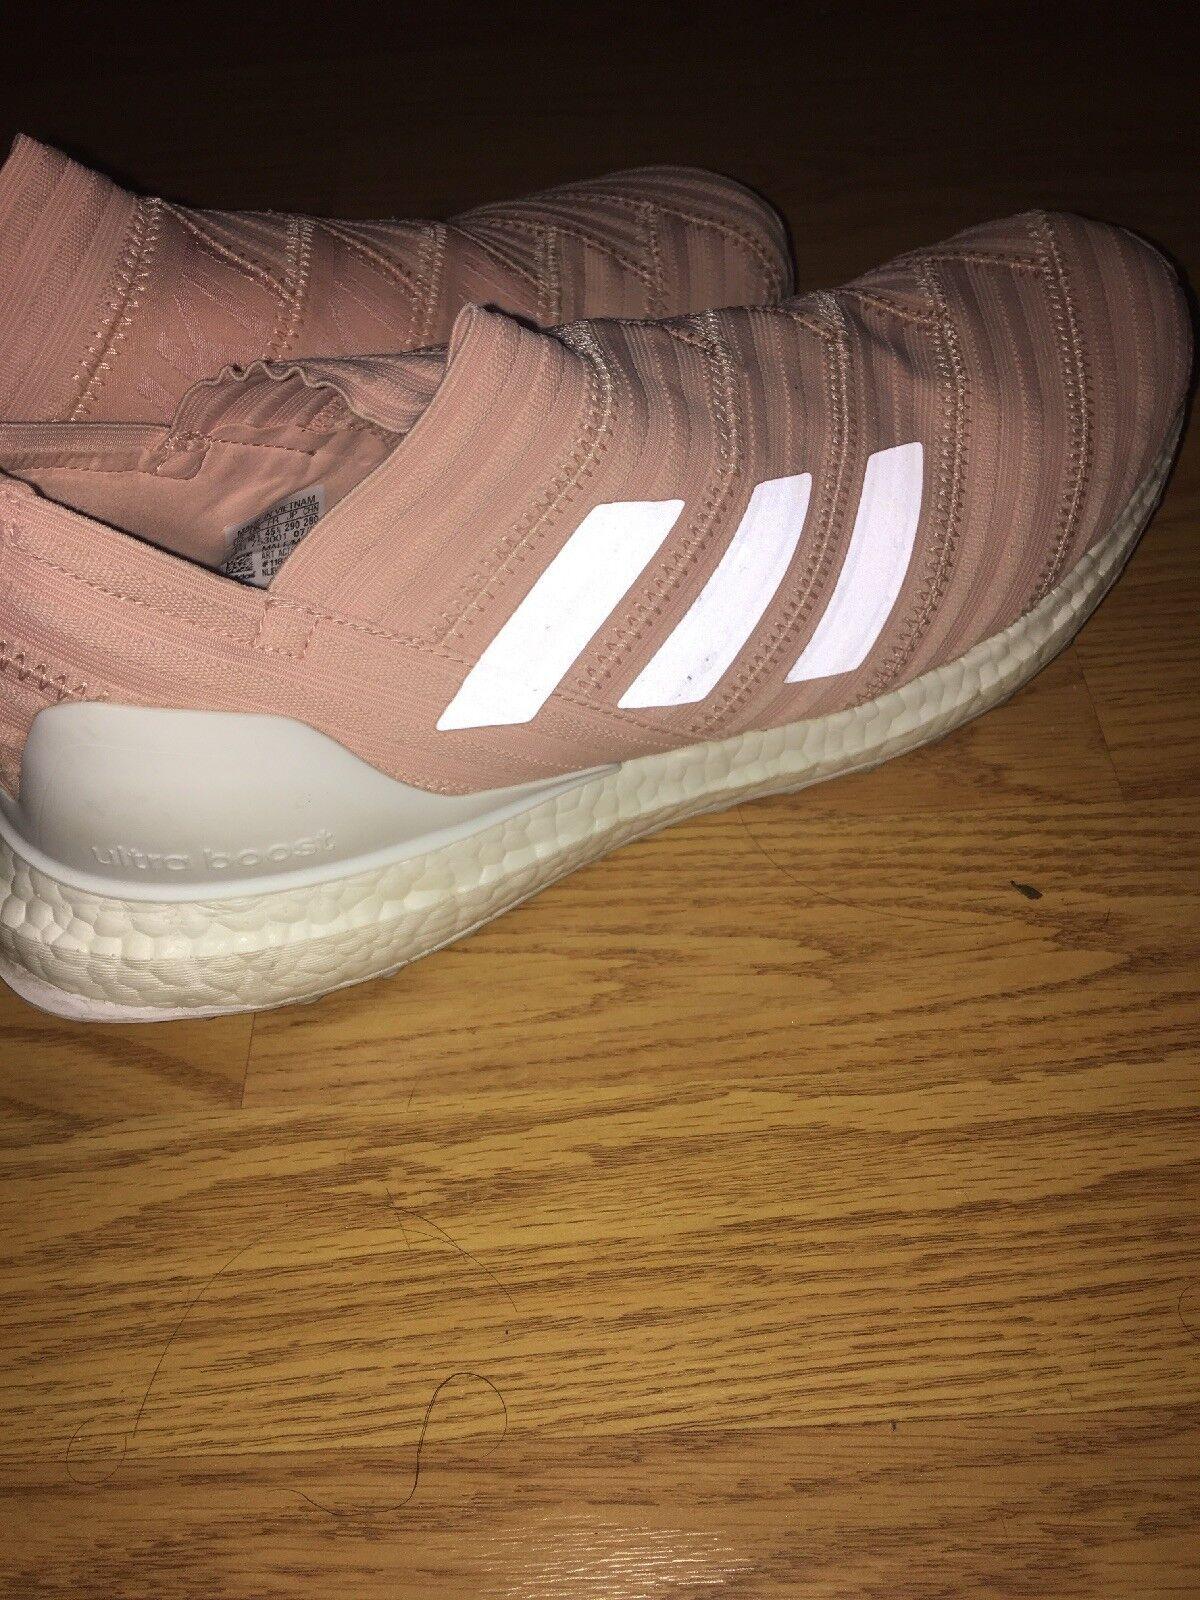 9fea522fa3ae Adidas Kith Nemeziz 17.1 17.1 17.1 Tango Ultraboost Pink Soccer Football  Shoe Size 11 7ce30a